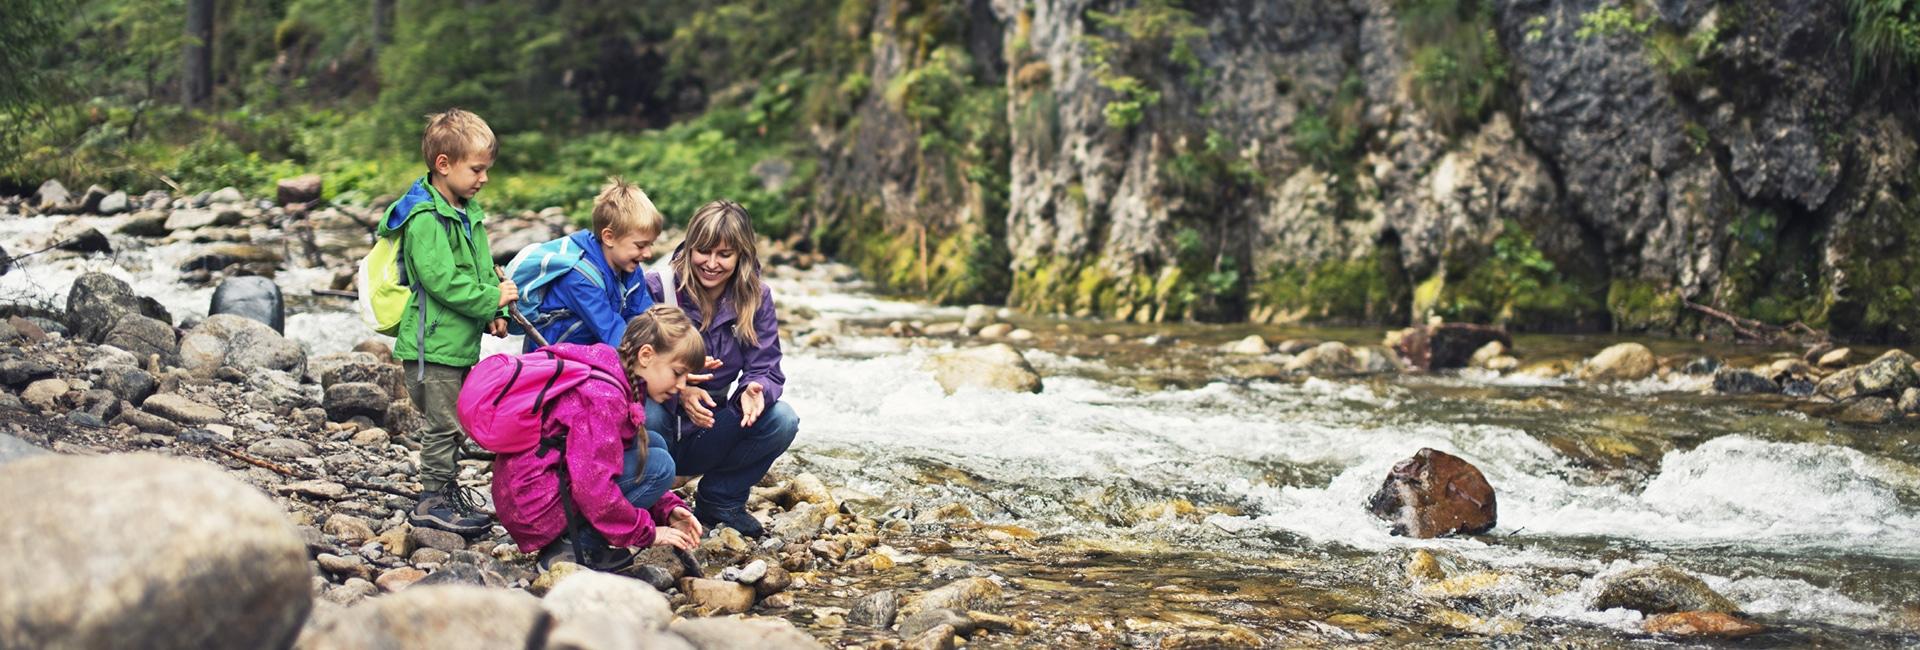 Sommerurlaub & Wanderurlaub in Wagrain, Salzburger Sportwelt, Blankgut